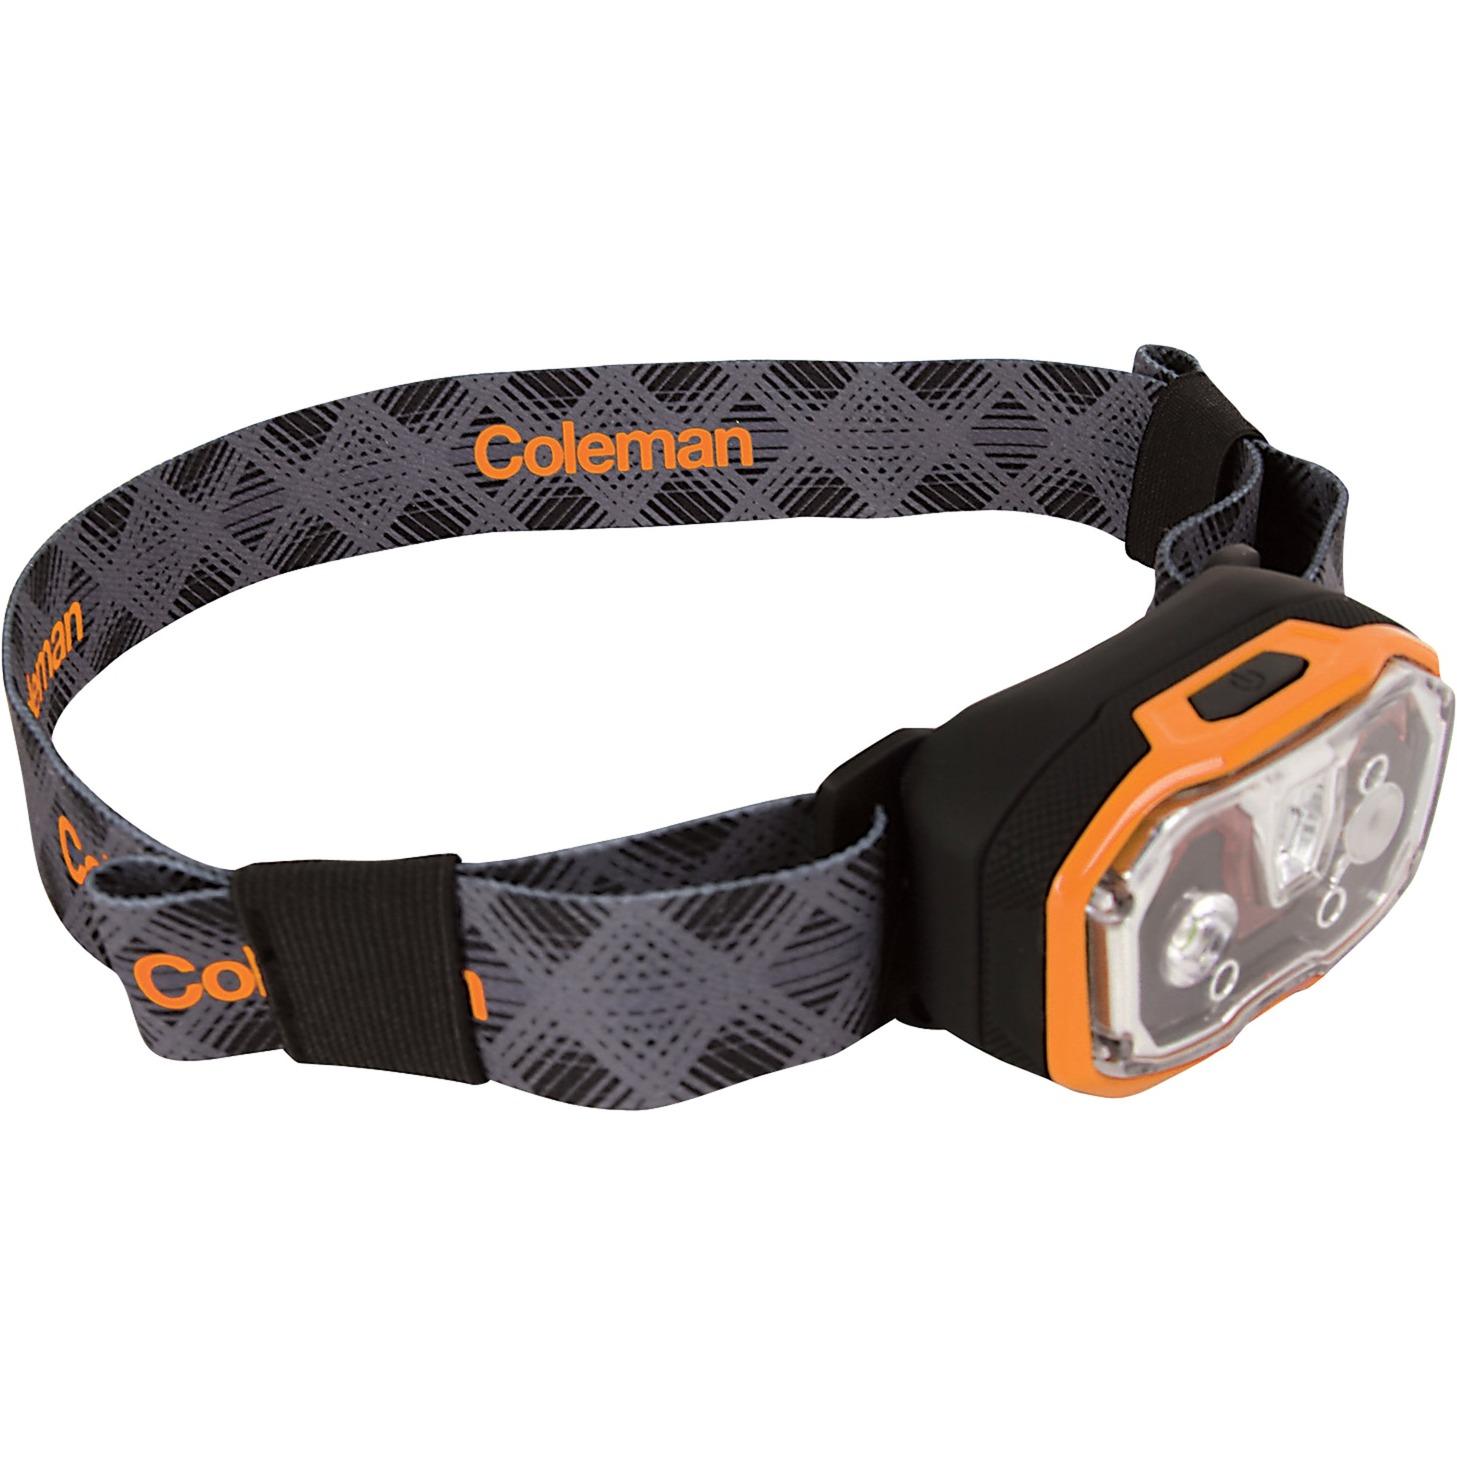 2000028858, Lámpara LED